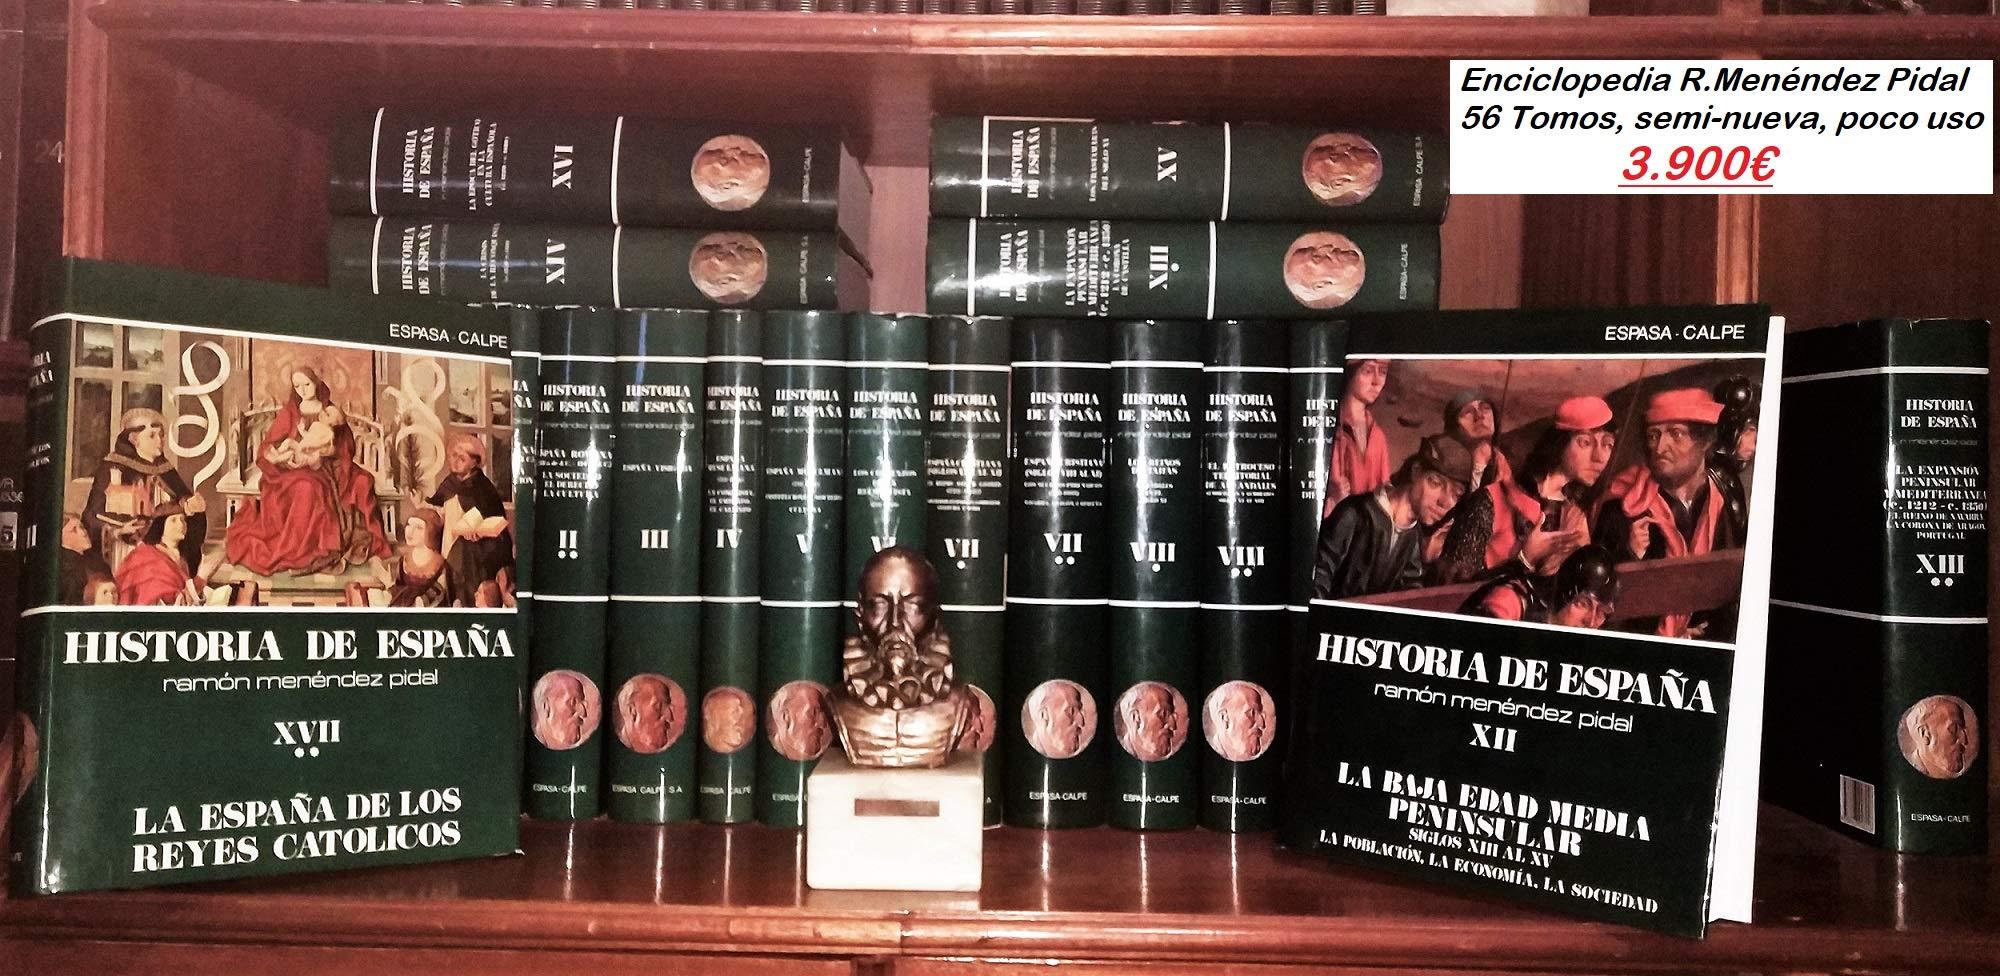 Historia de España obra completa 60 vols. publicados Historia de España Menéndez Pidal: Amazon.es: Menendez Pidal, Ramon: Libros